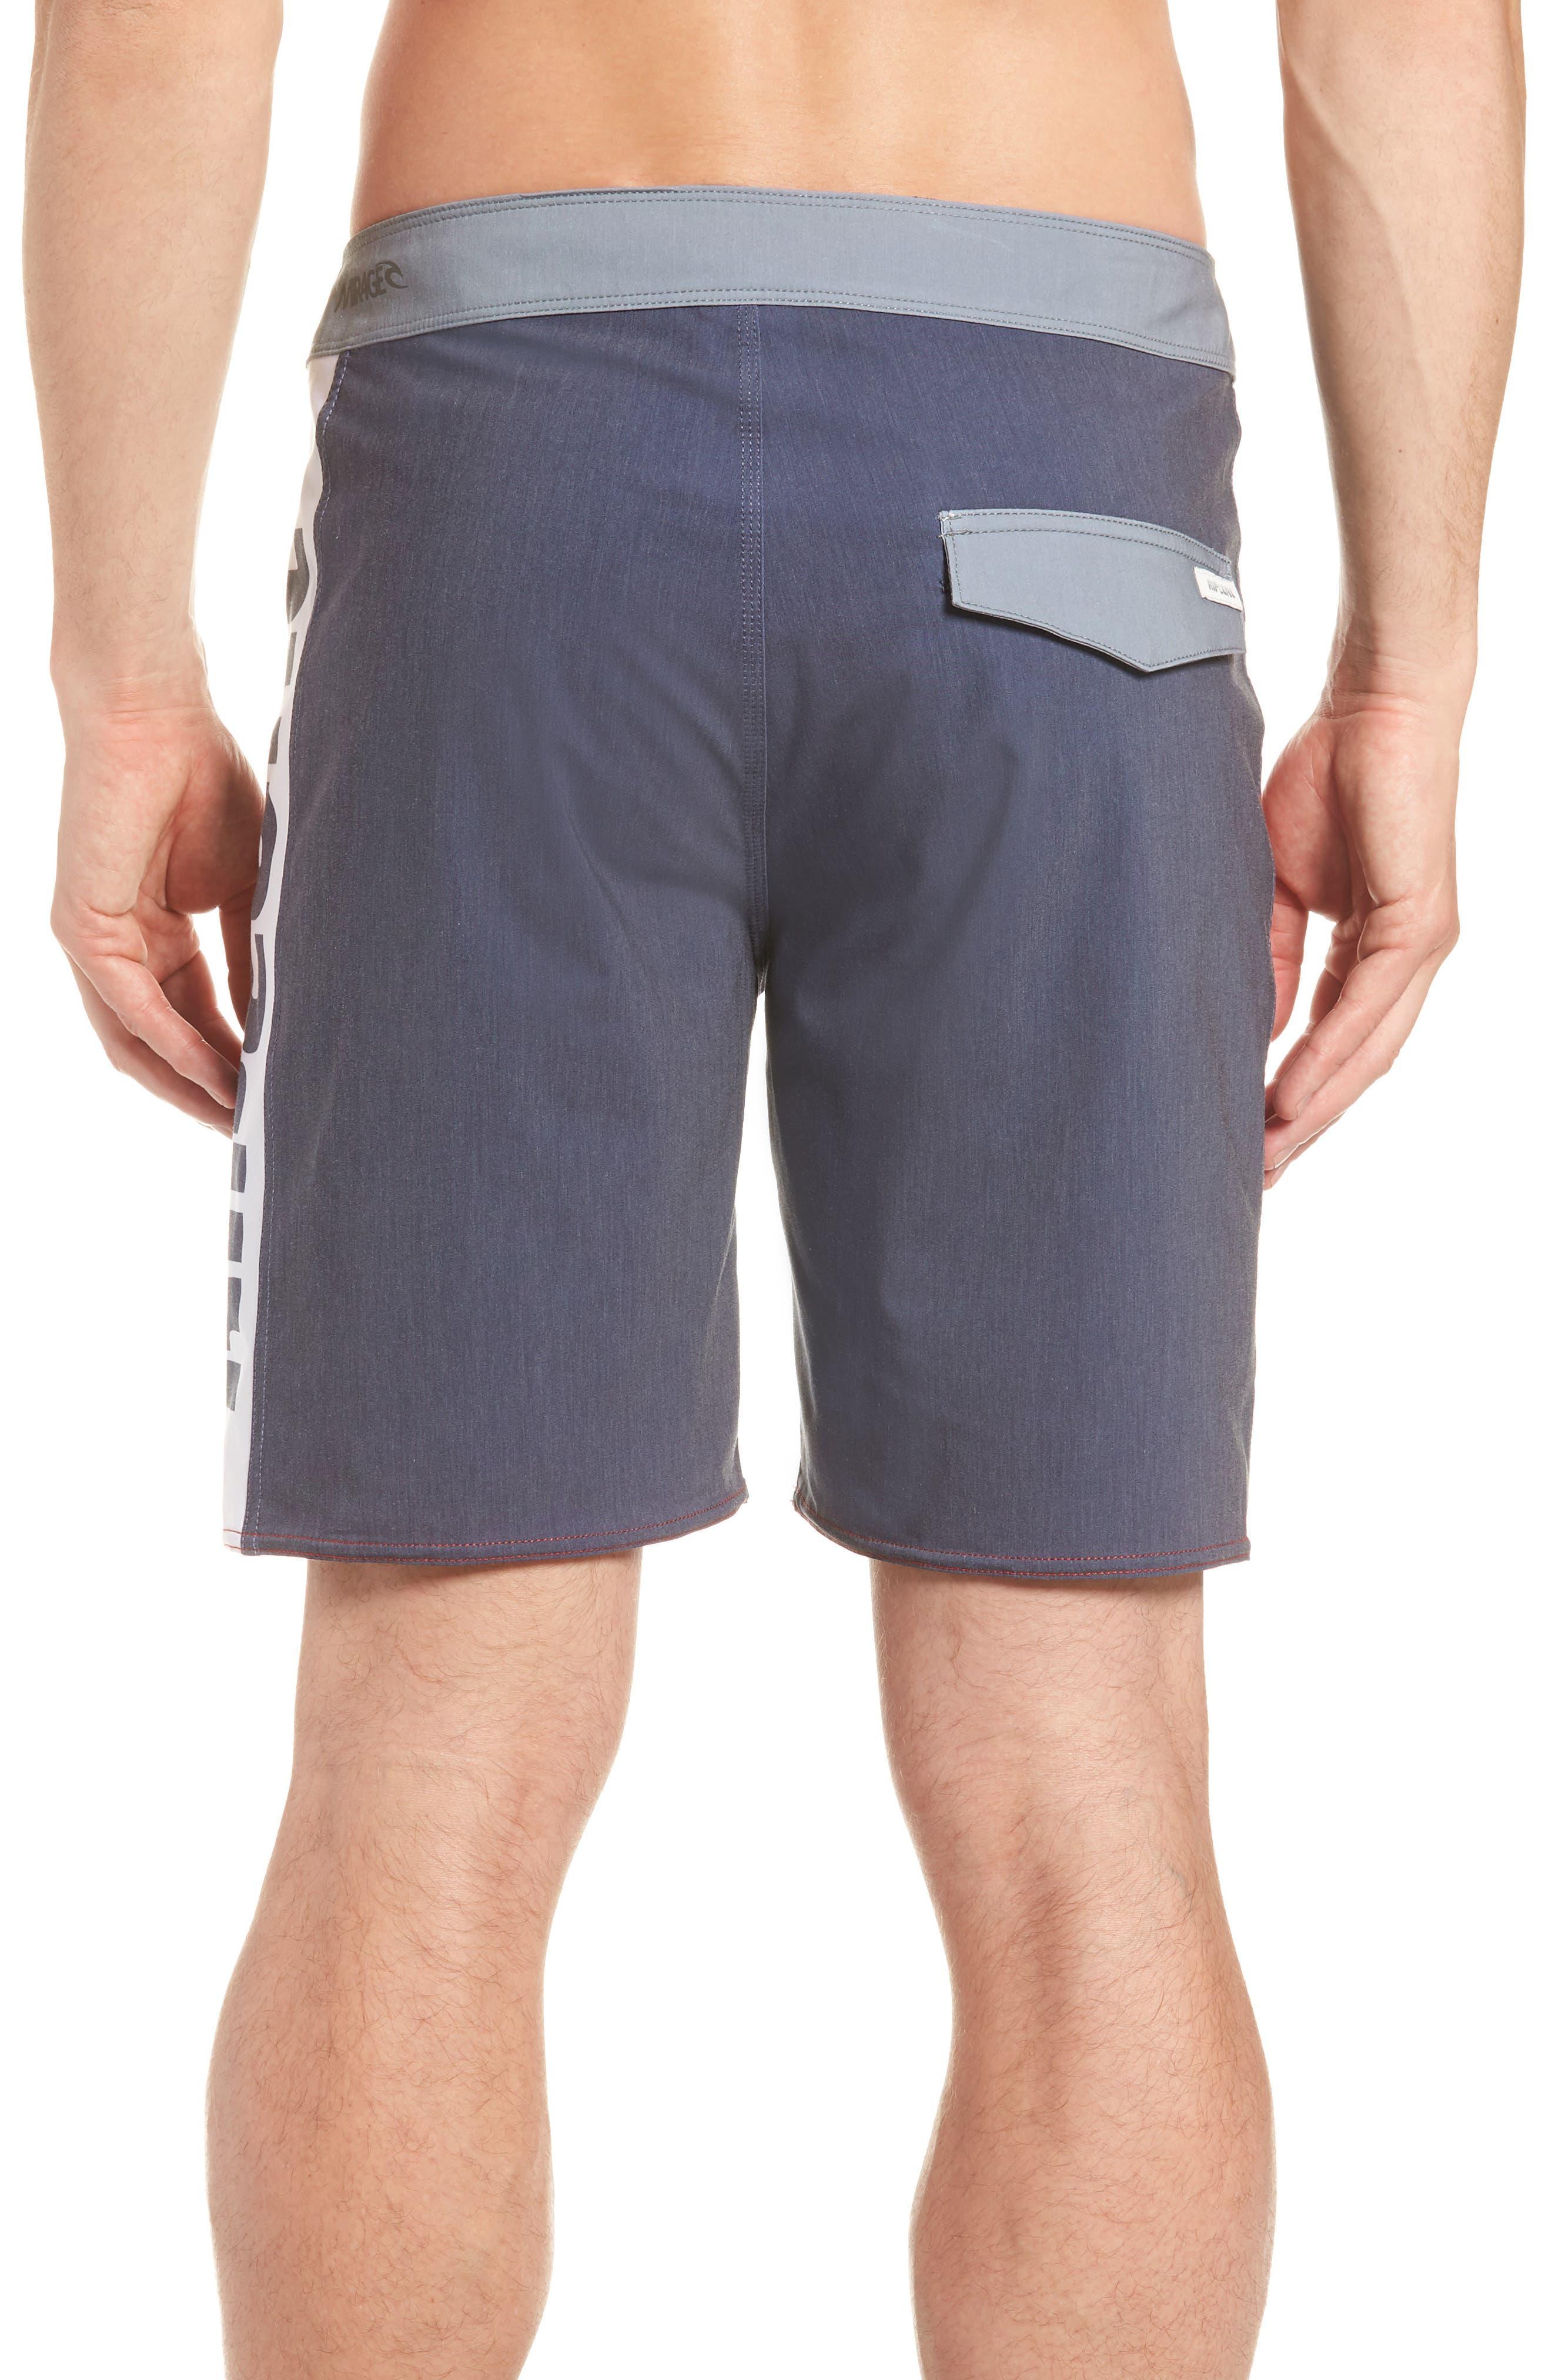 Mirage Owen Stretch Board Shorts,                             Alternate thumbnail 2, color,                             600